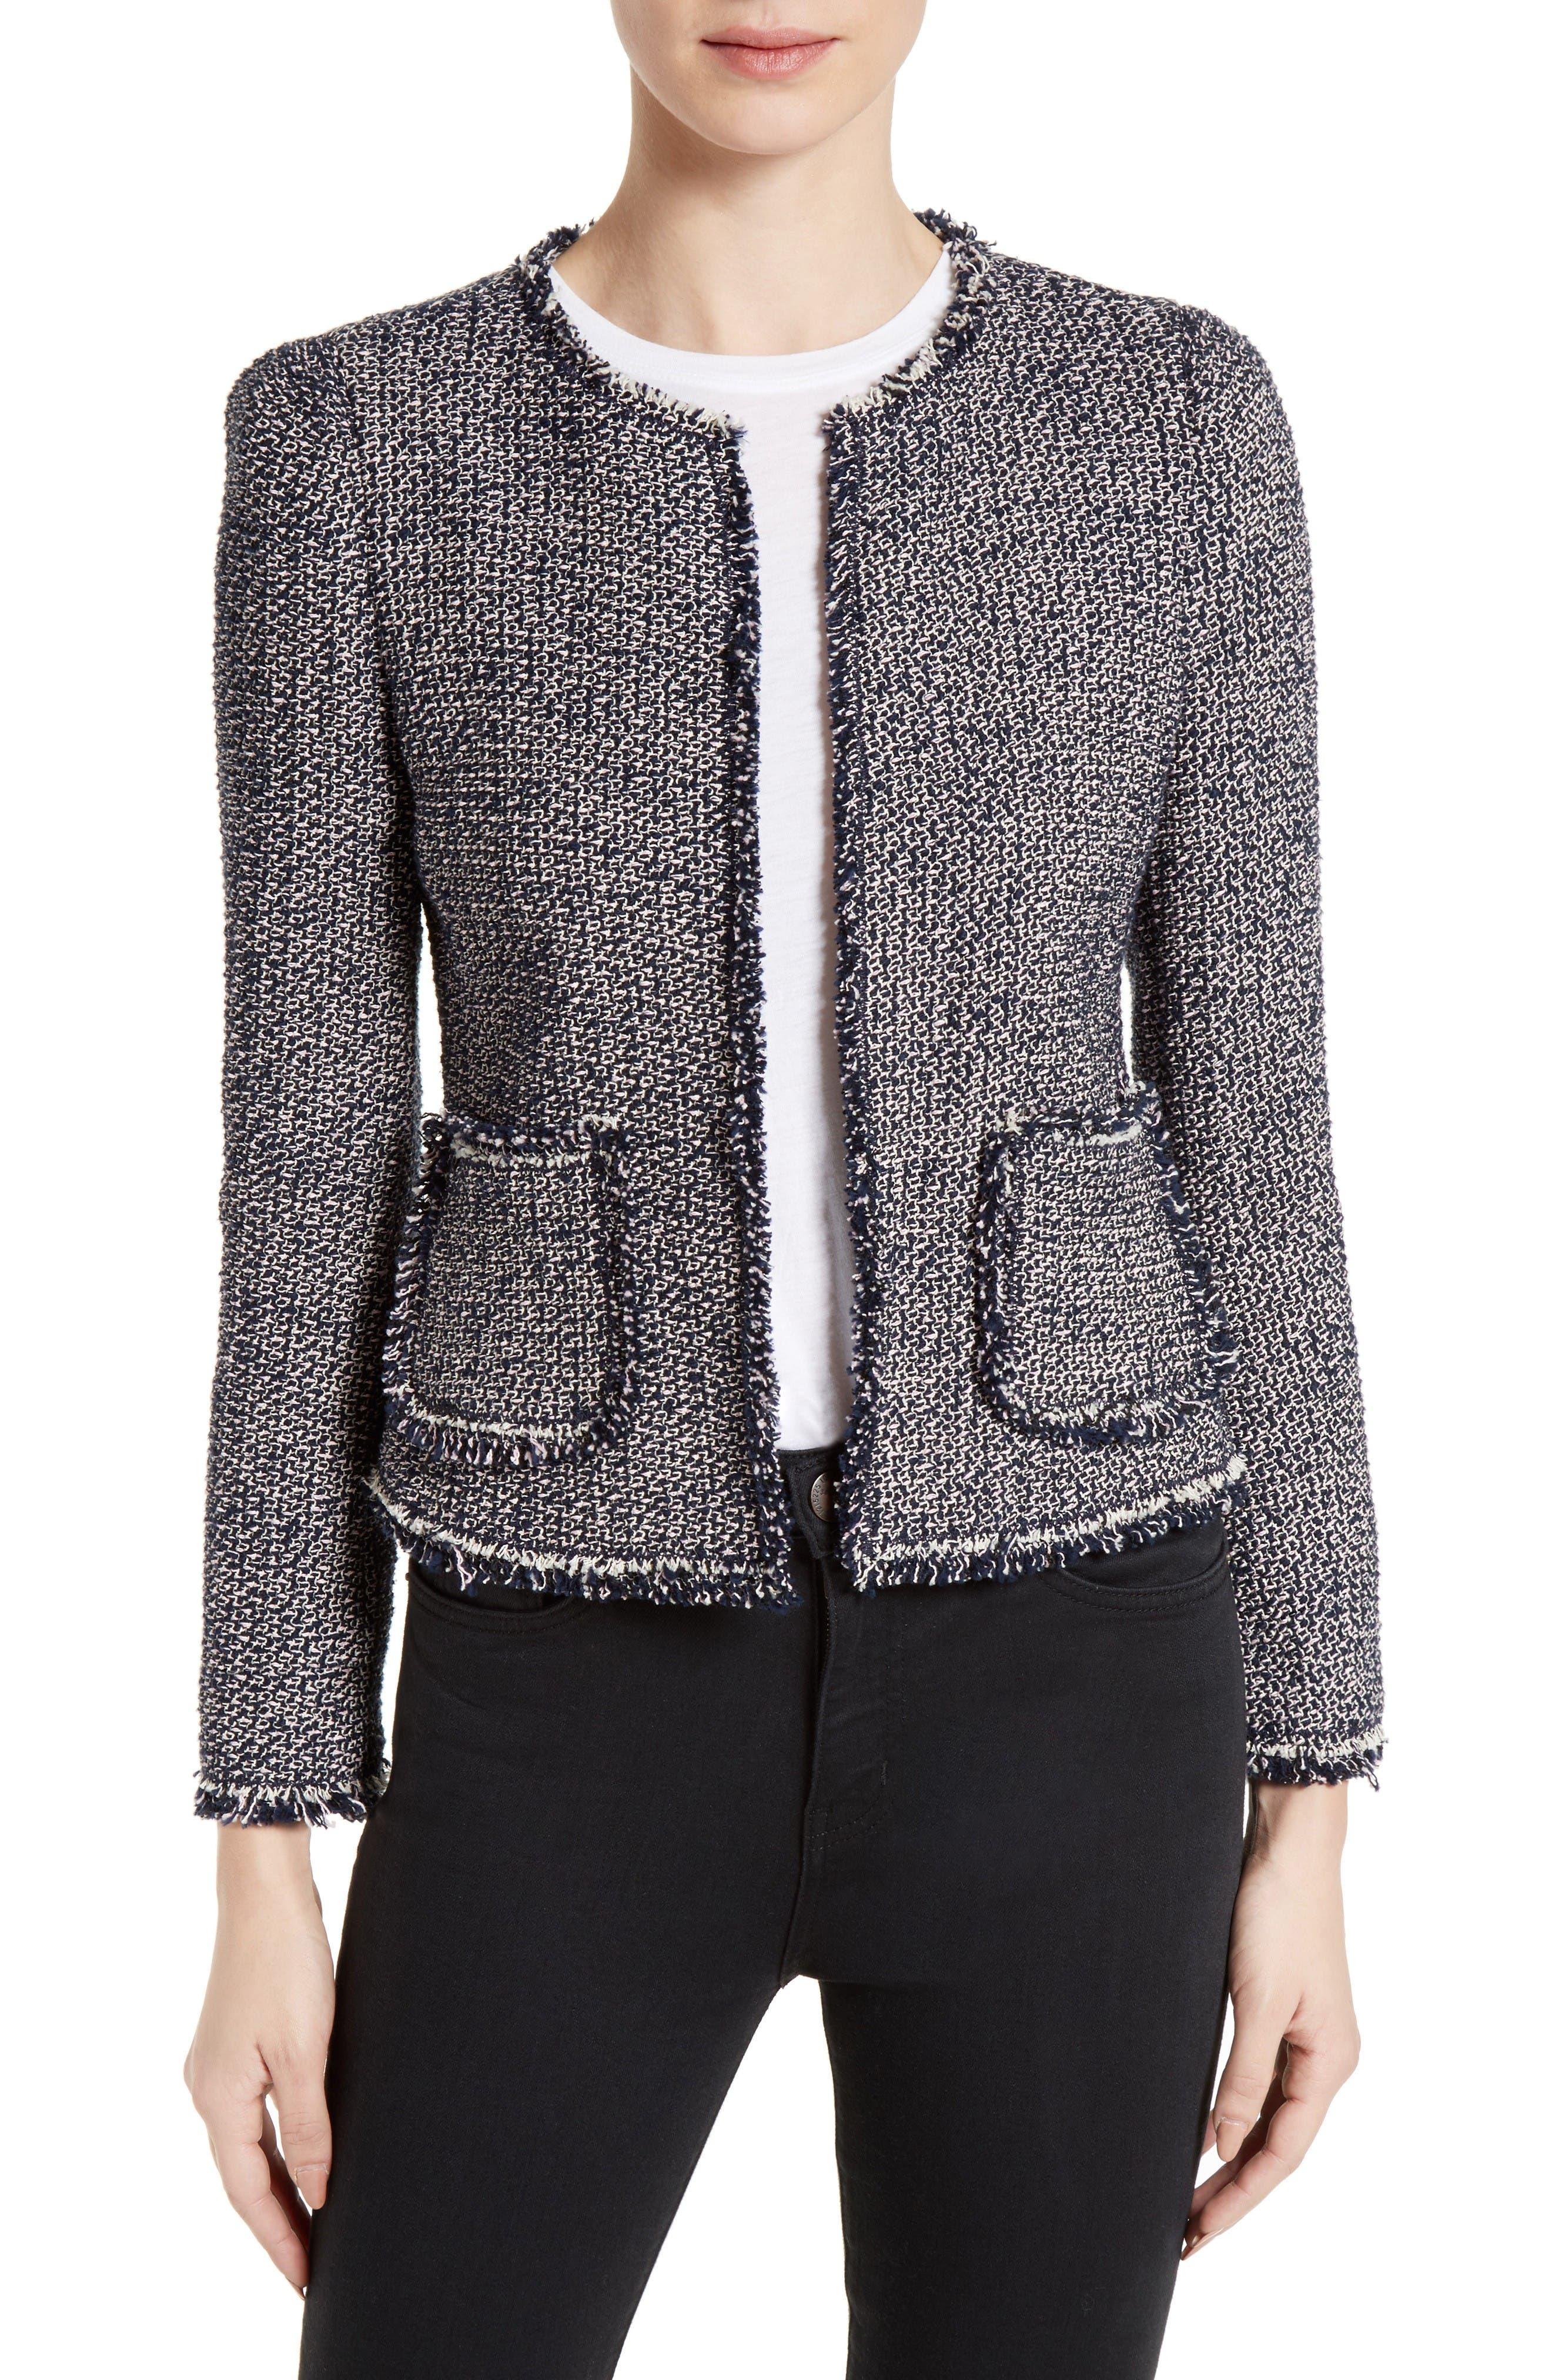 Alternate Image 1 Selected - Rebecca Taylor Confetti Tweed Jacket